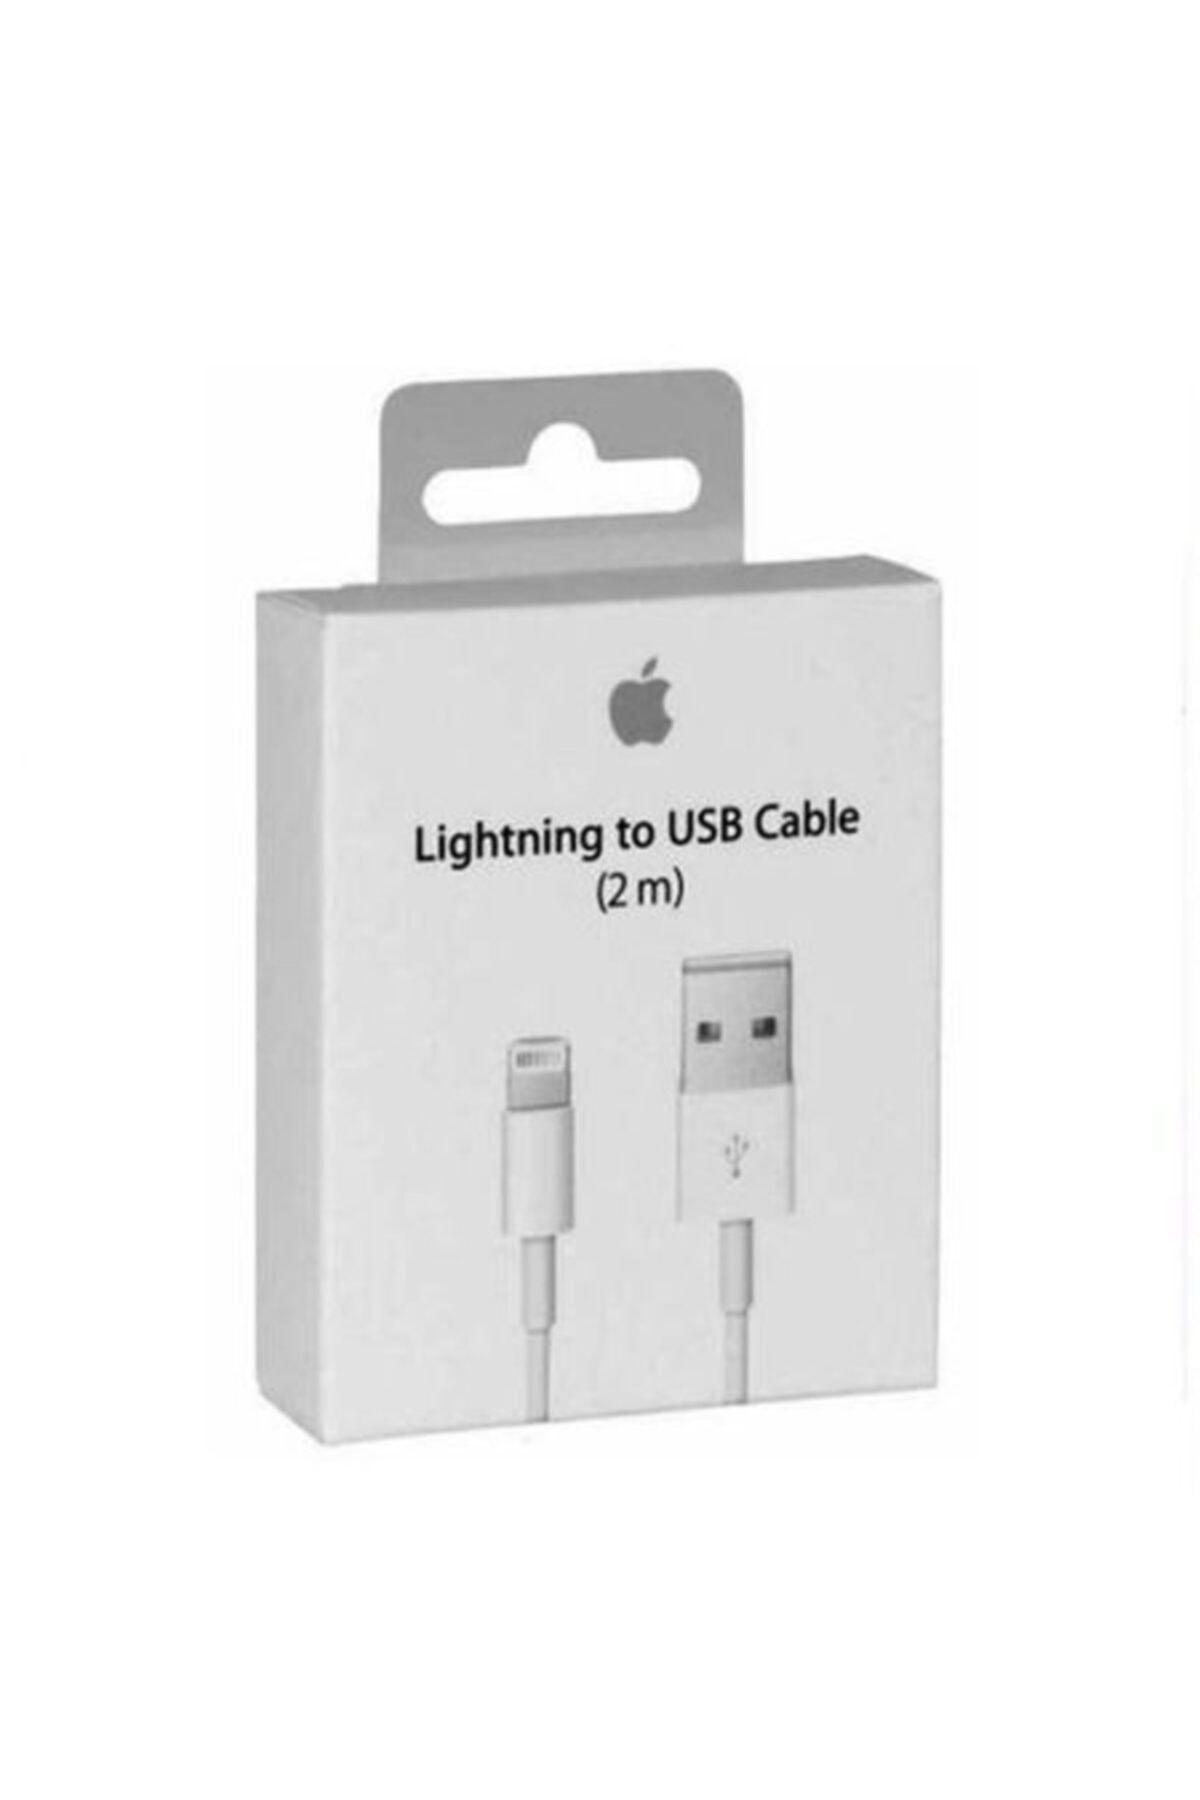 Apple 2 Metre Iphone Şarj Lıghtıng Uyumlu Usb Data Kablosu 5 5s Se 6 6s 6 Plus 7 7 Plus 8 8 Plus X Xs Max 1